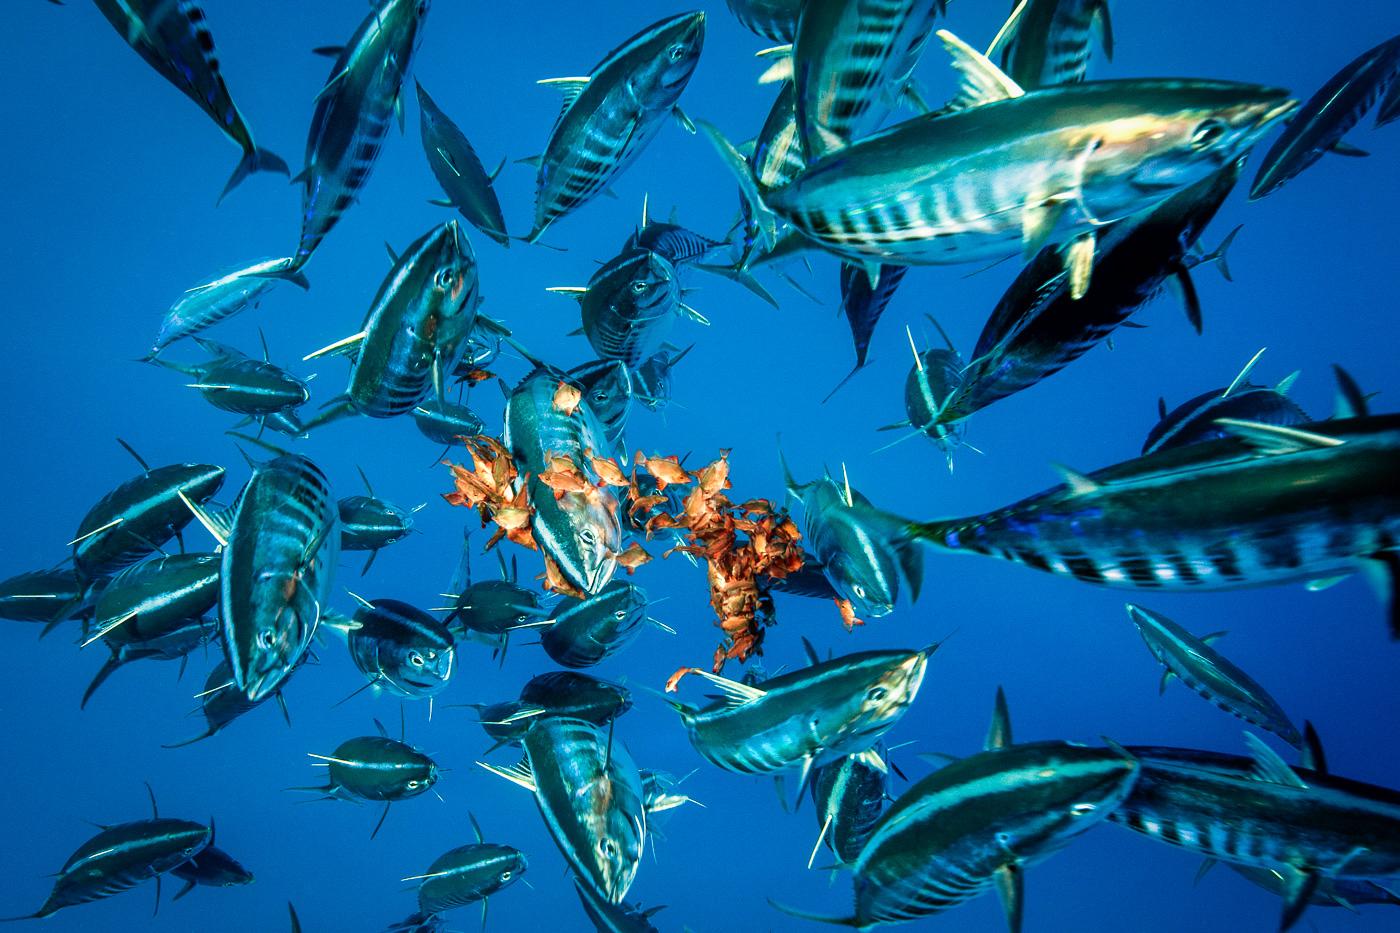 bonito tuna hunt for fish baitball azores